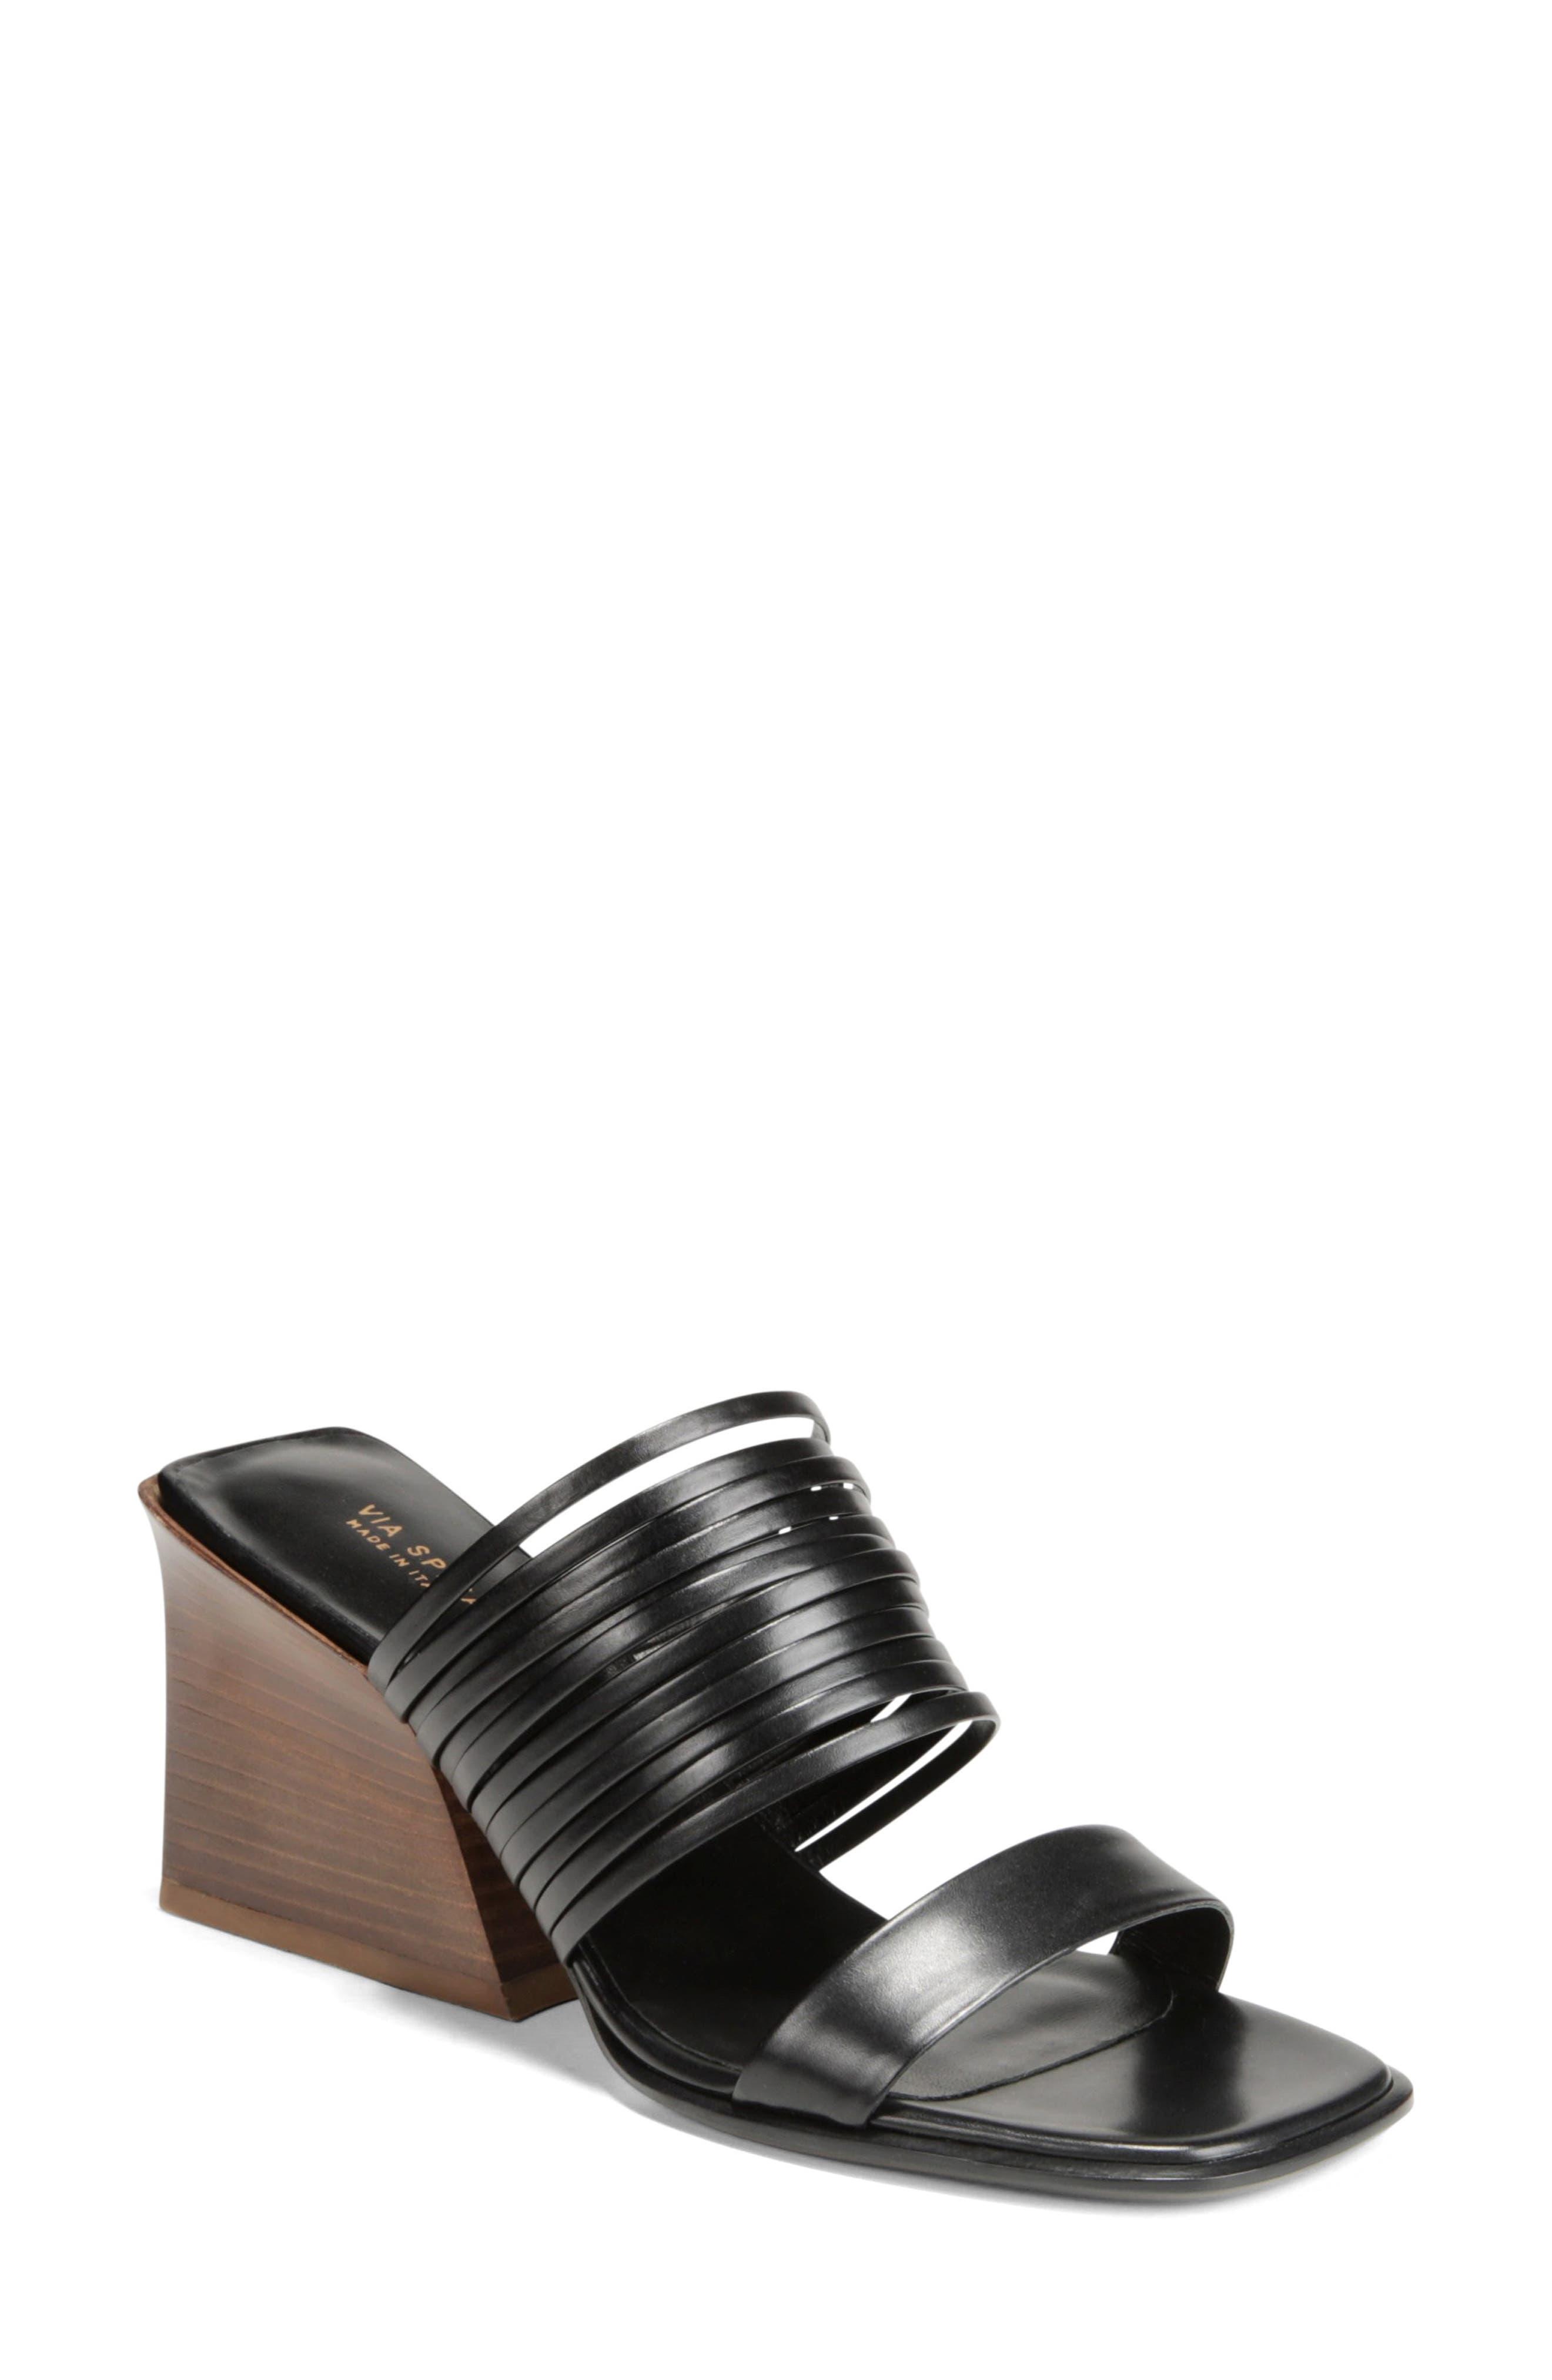 VIA SPIGA, Mariam Slide Sandal, Main thumbnail 1, color, BLACK